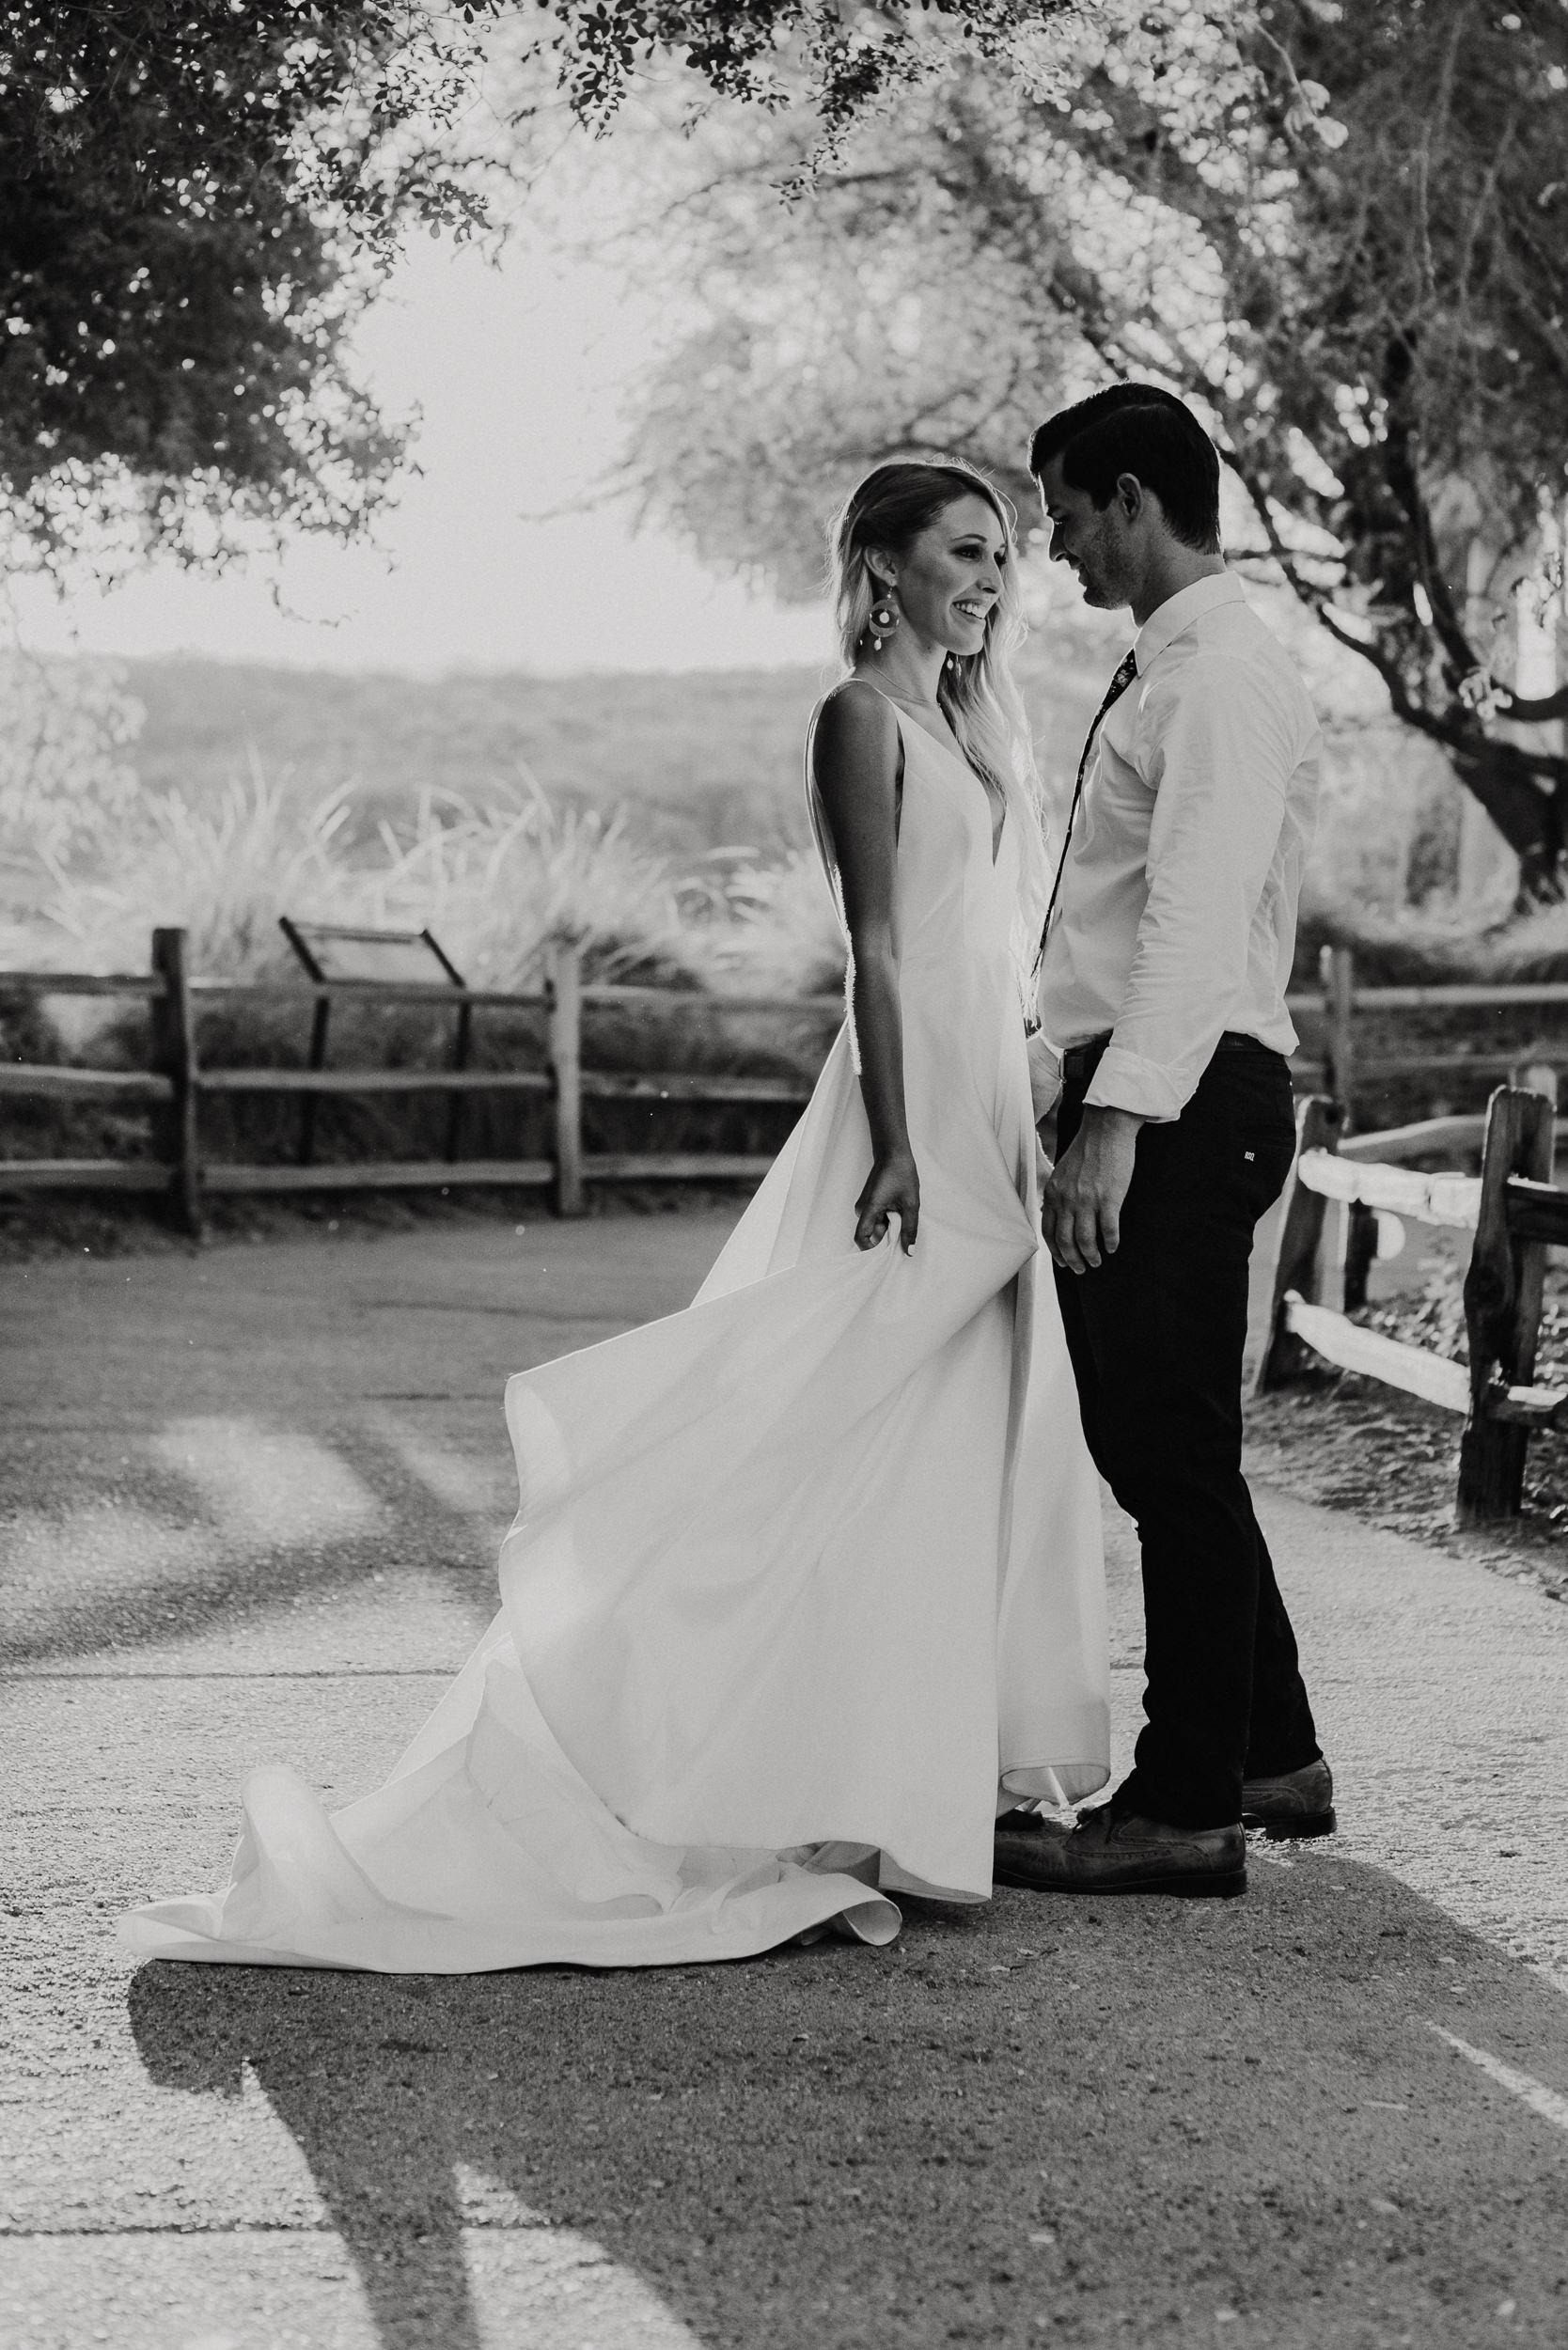 sChelsie + Chris - The Desert Shootout Wedding Romantics at The Living Desert-145.jpg